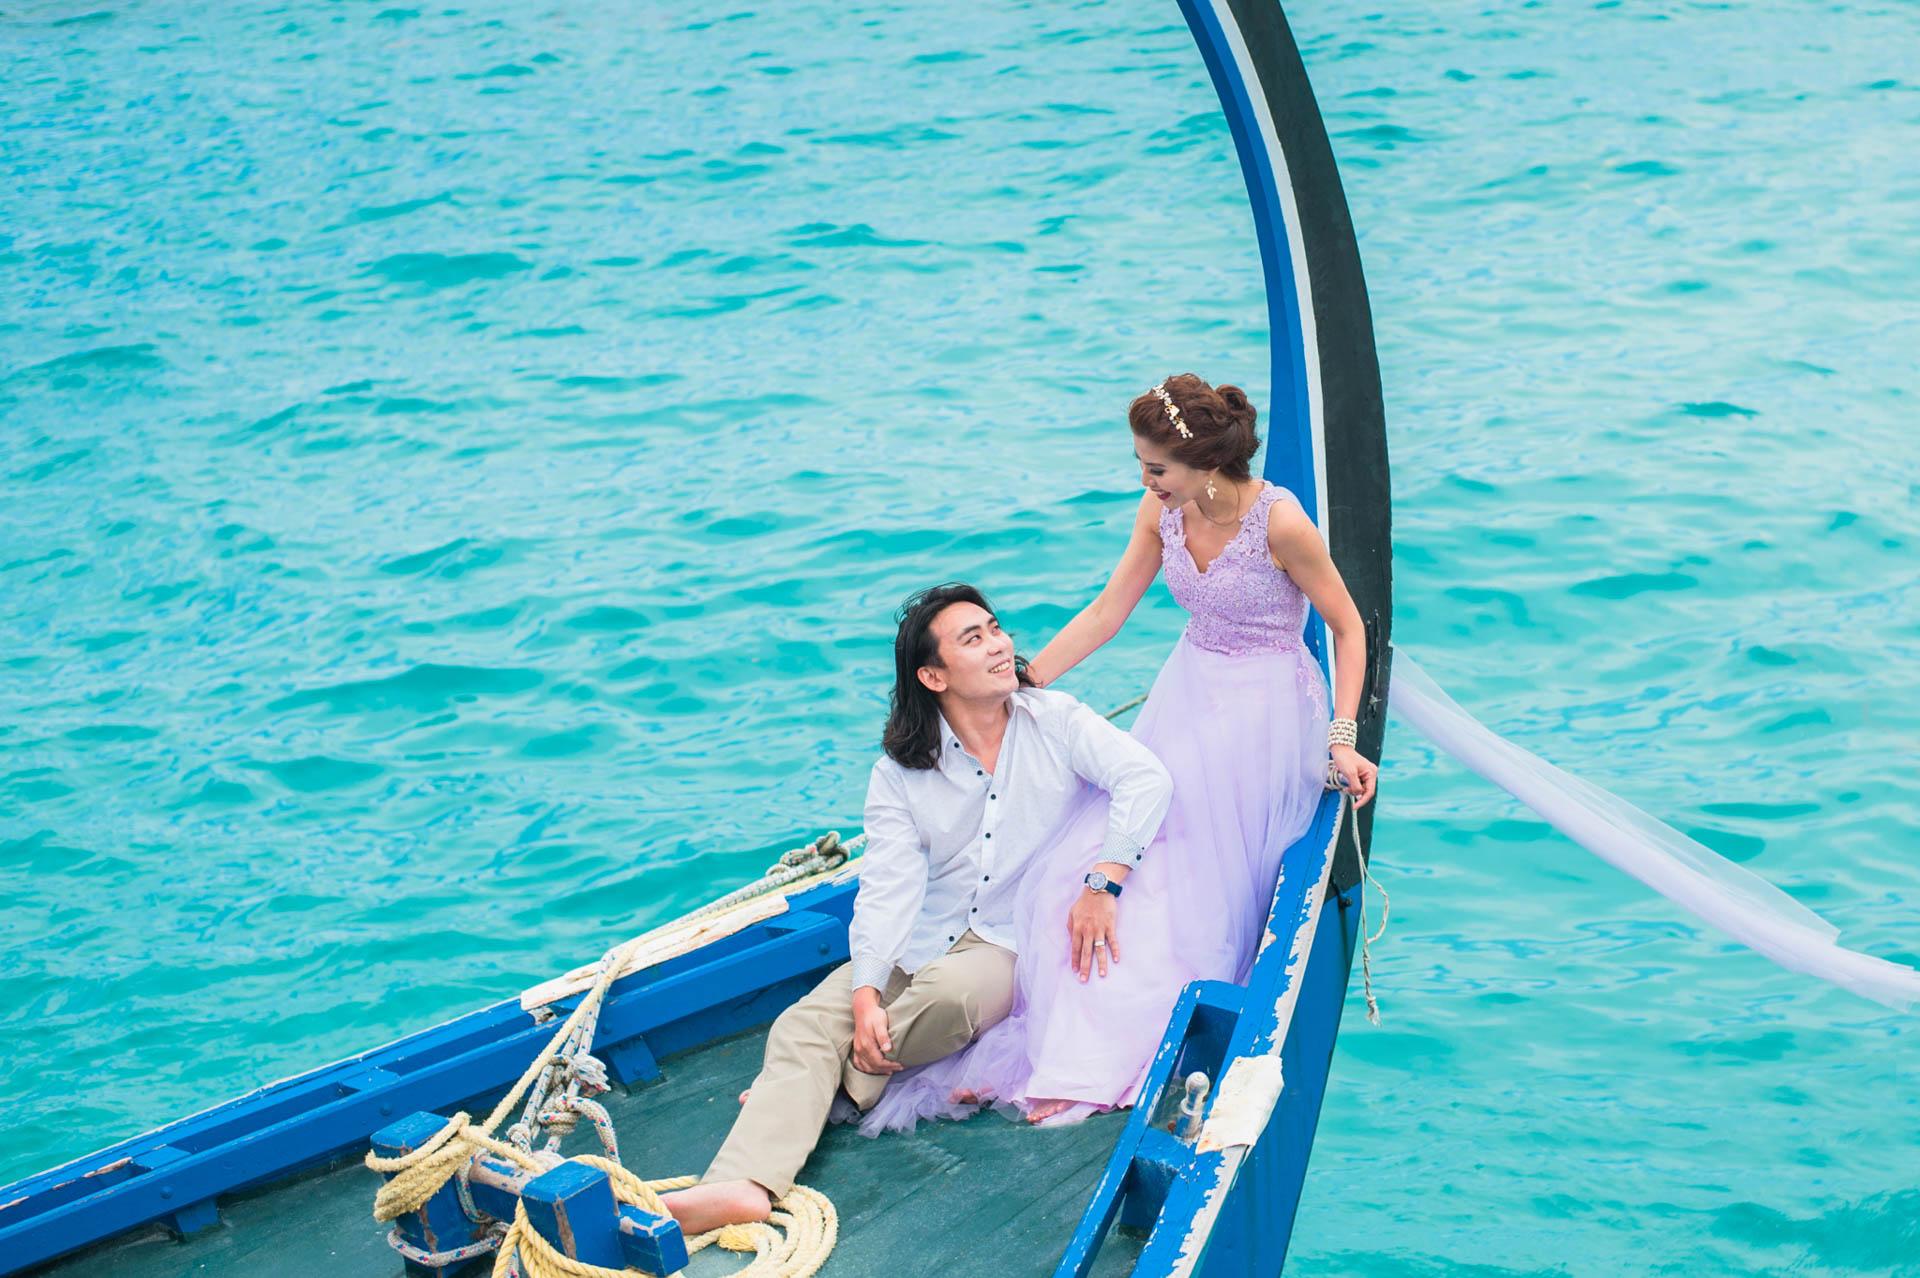 Chih Chao Yu Shan Destination Wedding at Residence Maldives 51